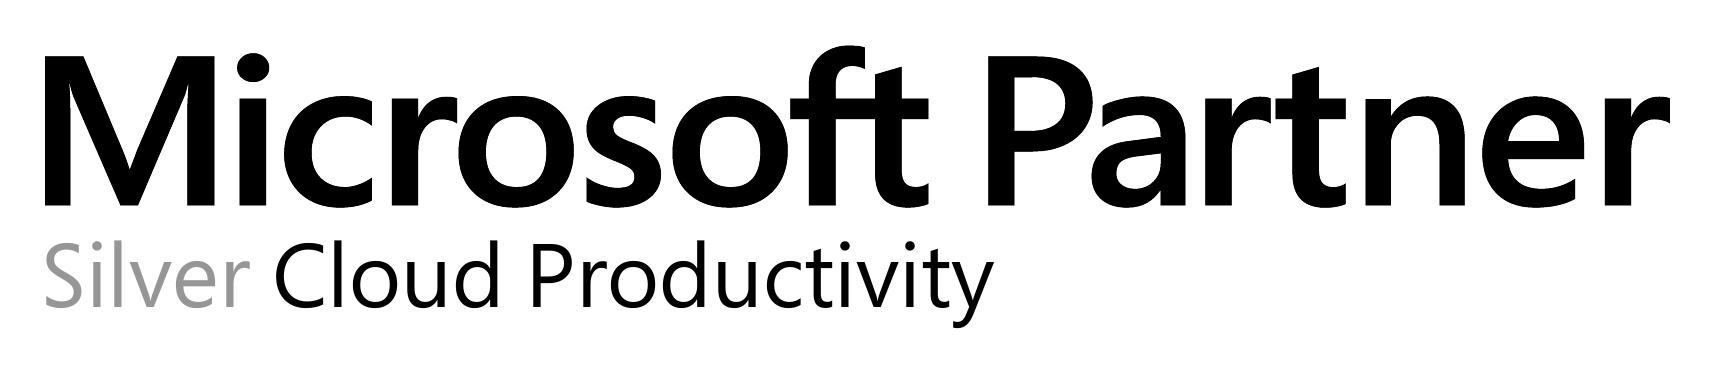 Microsoft Partner - Silver Cloud Productivity